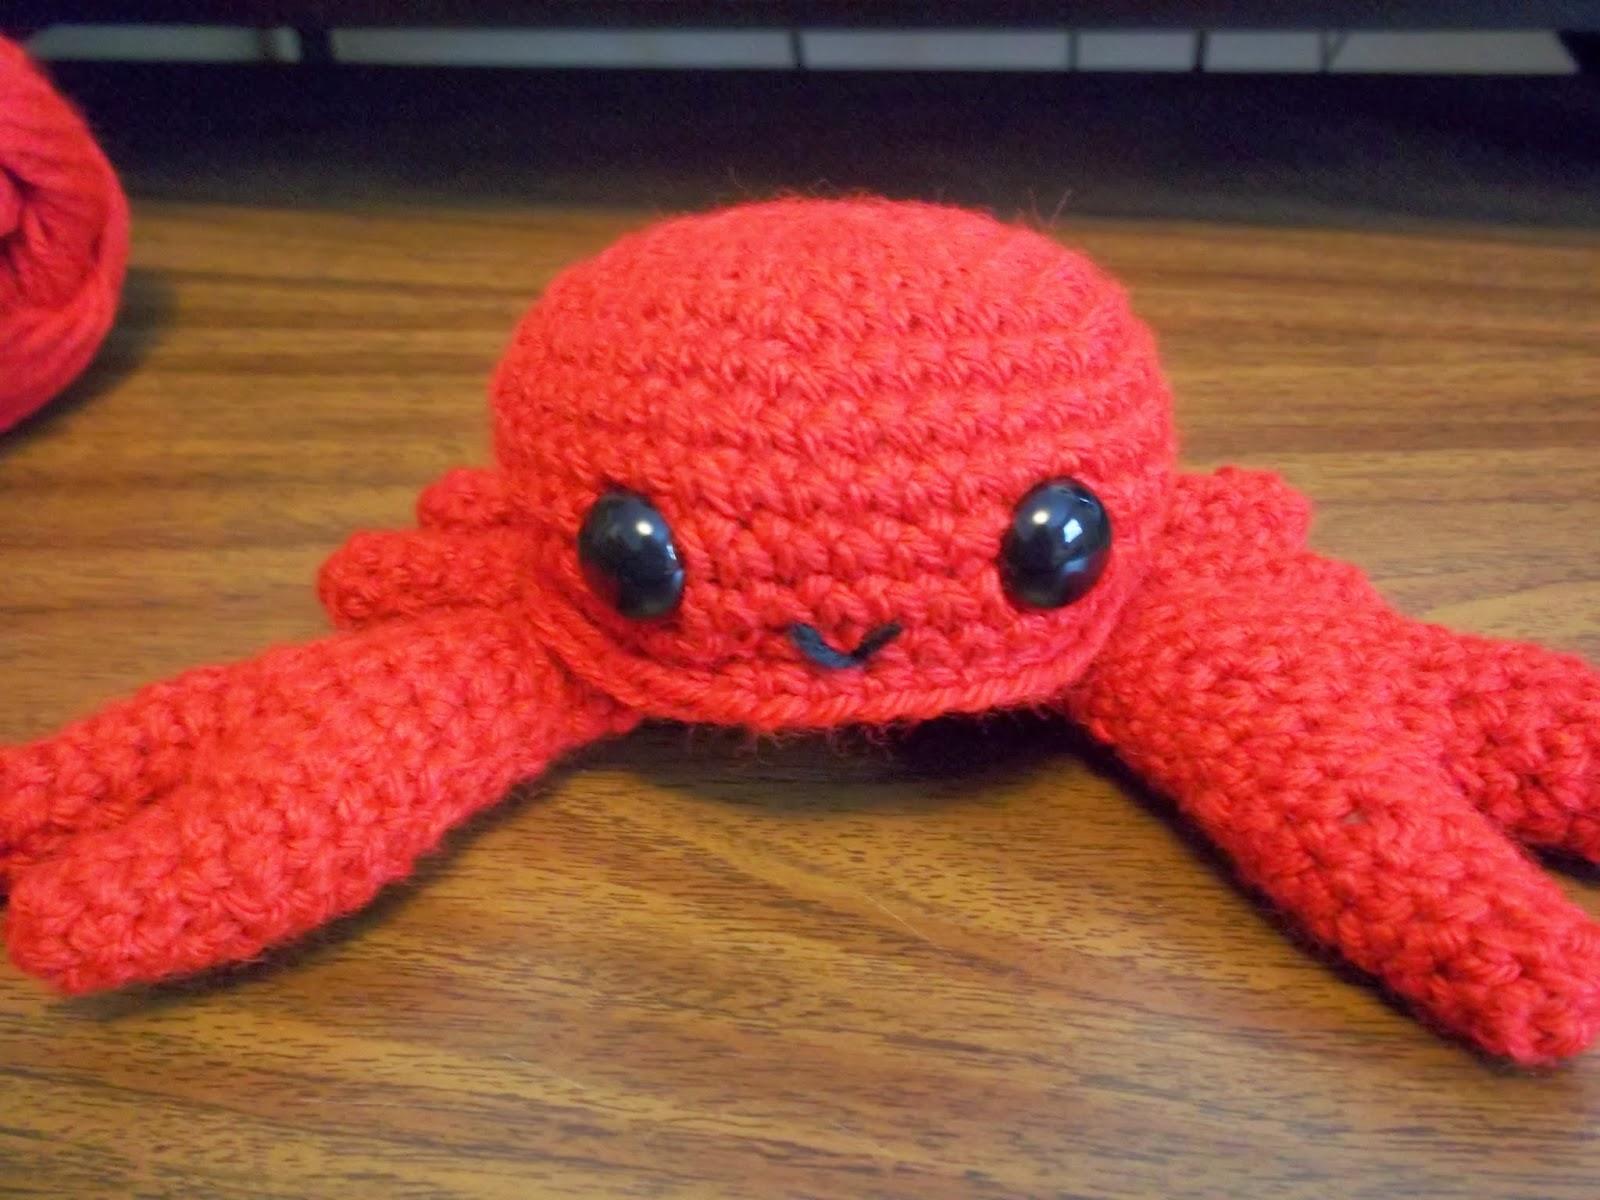 Eden is only a dream away: Crochet Crab Amigurumi Pattern